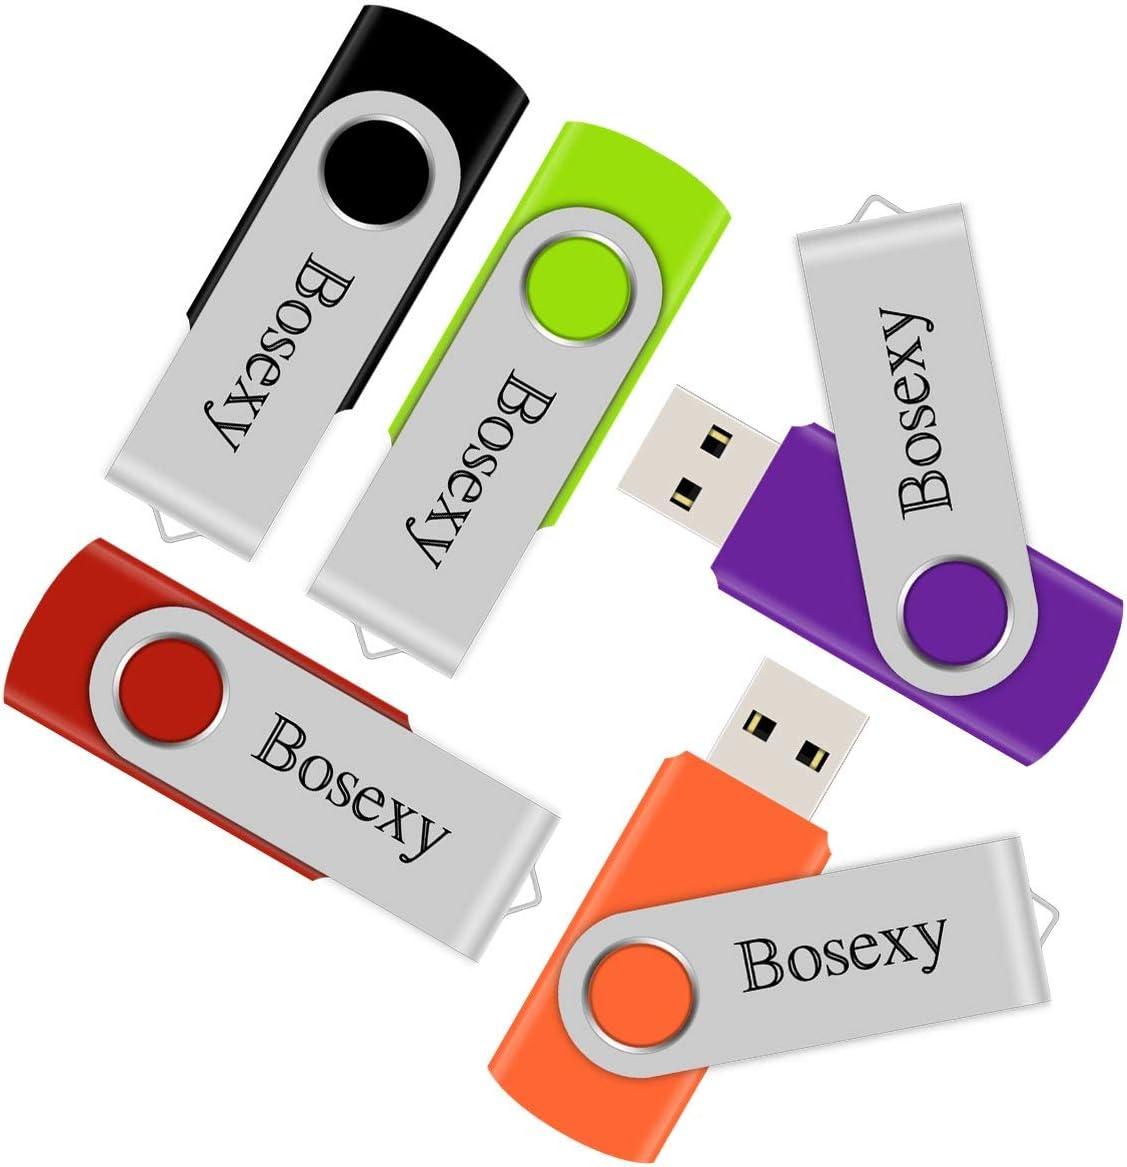 5 X 8GB USB Flash Drive, Bosexy Thumb Drive Memory Stick Swivel Keychain Design with Led Indicator, Black/Green/Red/Orange/Purple (5PCS, 8GB Each, Mix Color)